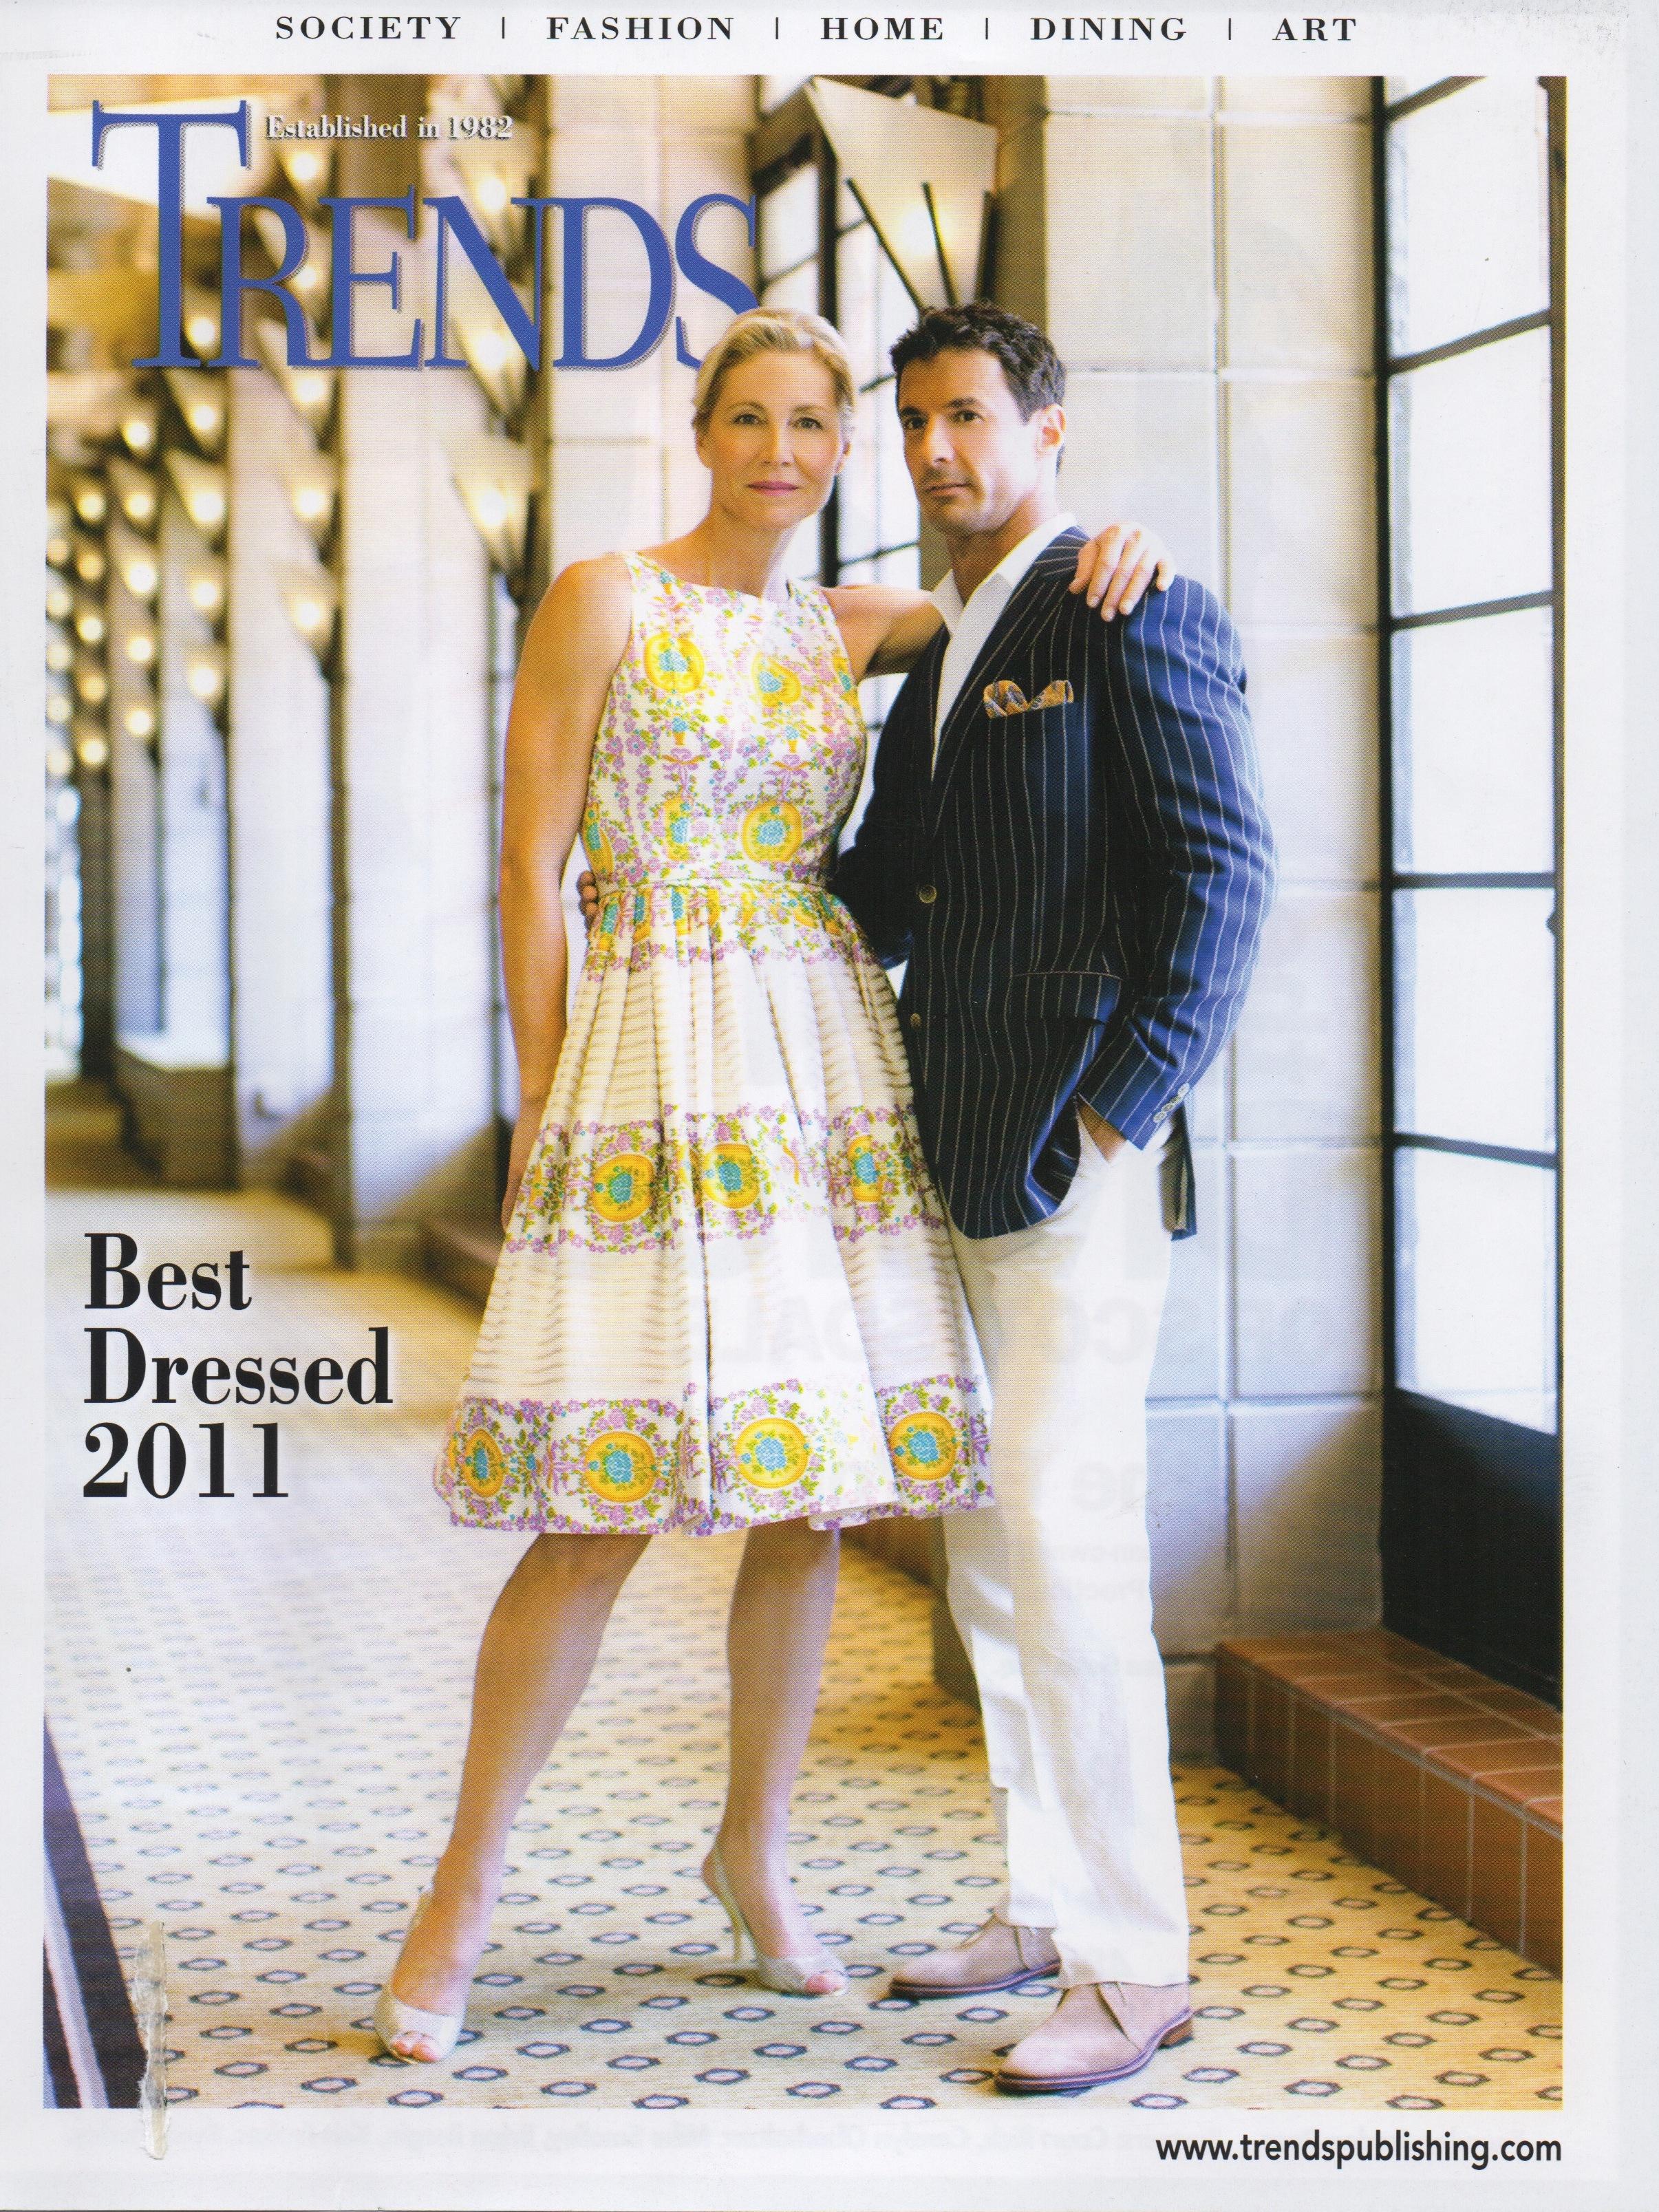 Trends Best Dressed.jpeg